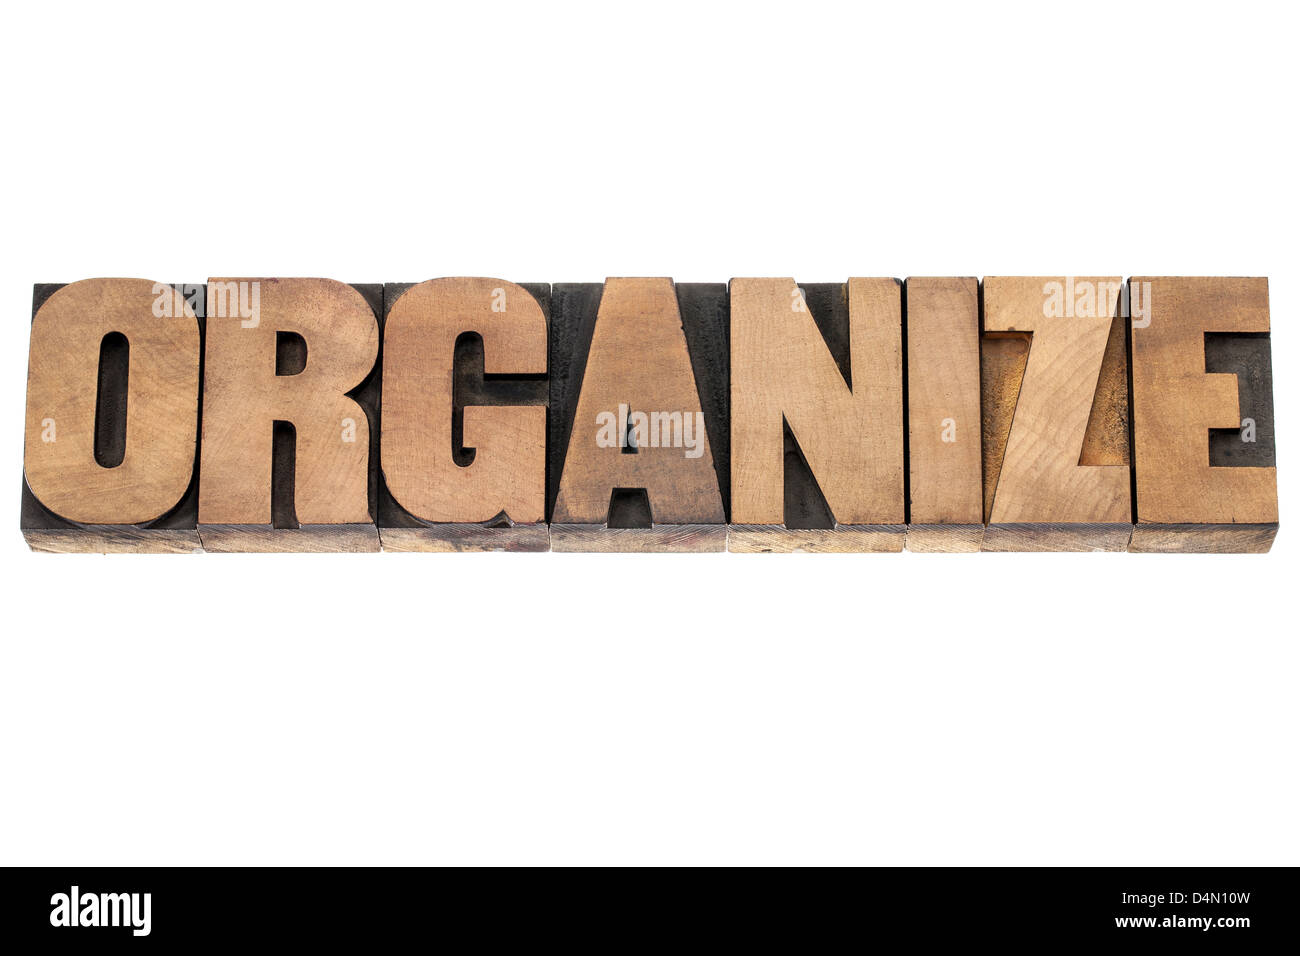 organize word - isolated word in vintage letterpress wood type printing blocks - Stock Image